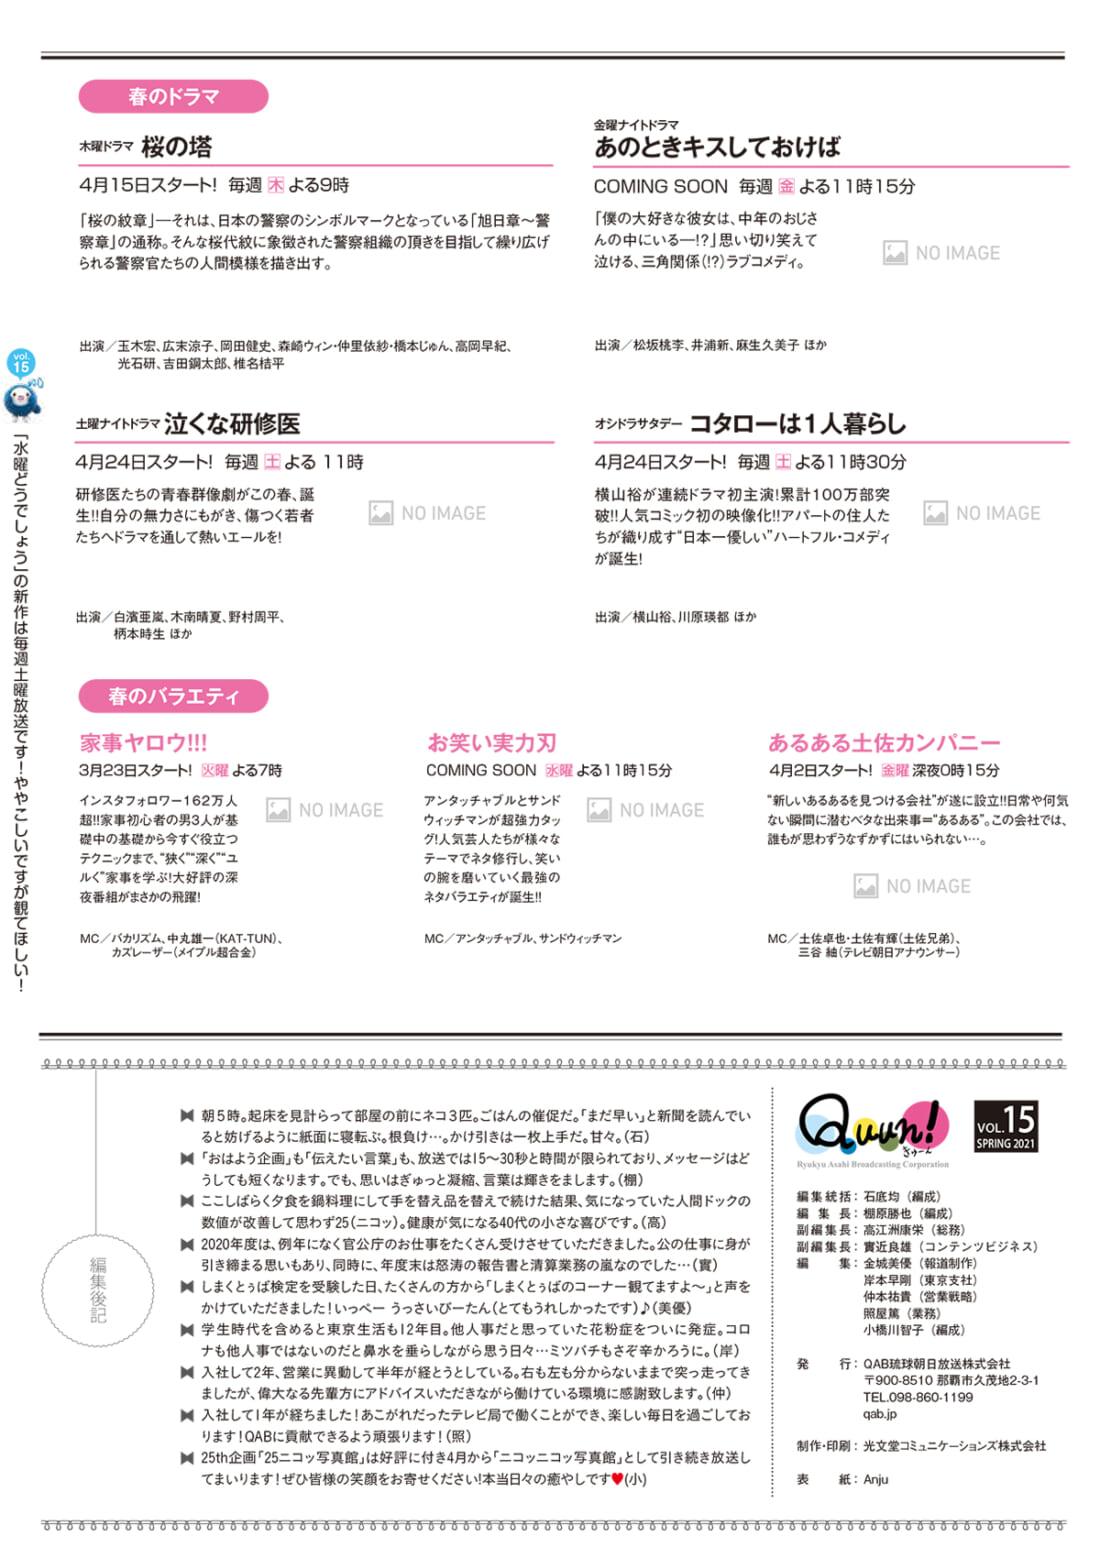 https://www.qab.co.jp/qgoro/wp-content/uploads/quun_1515-1100x1558.jpg